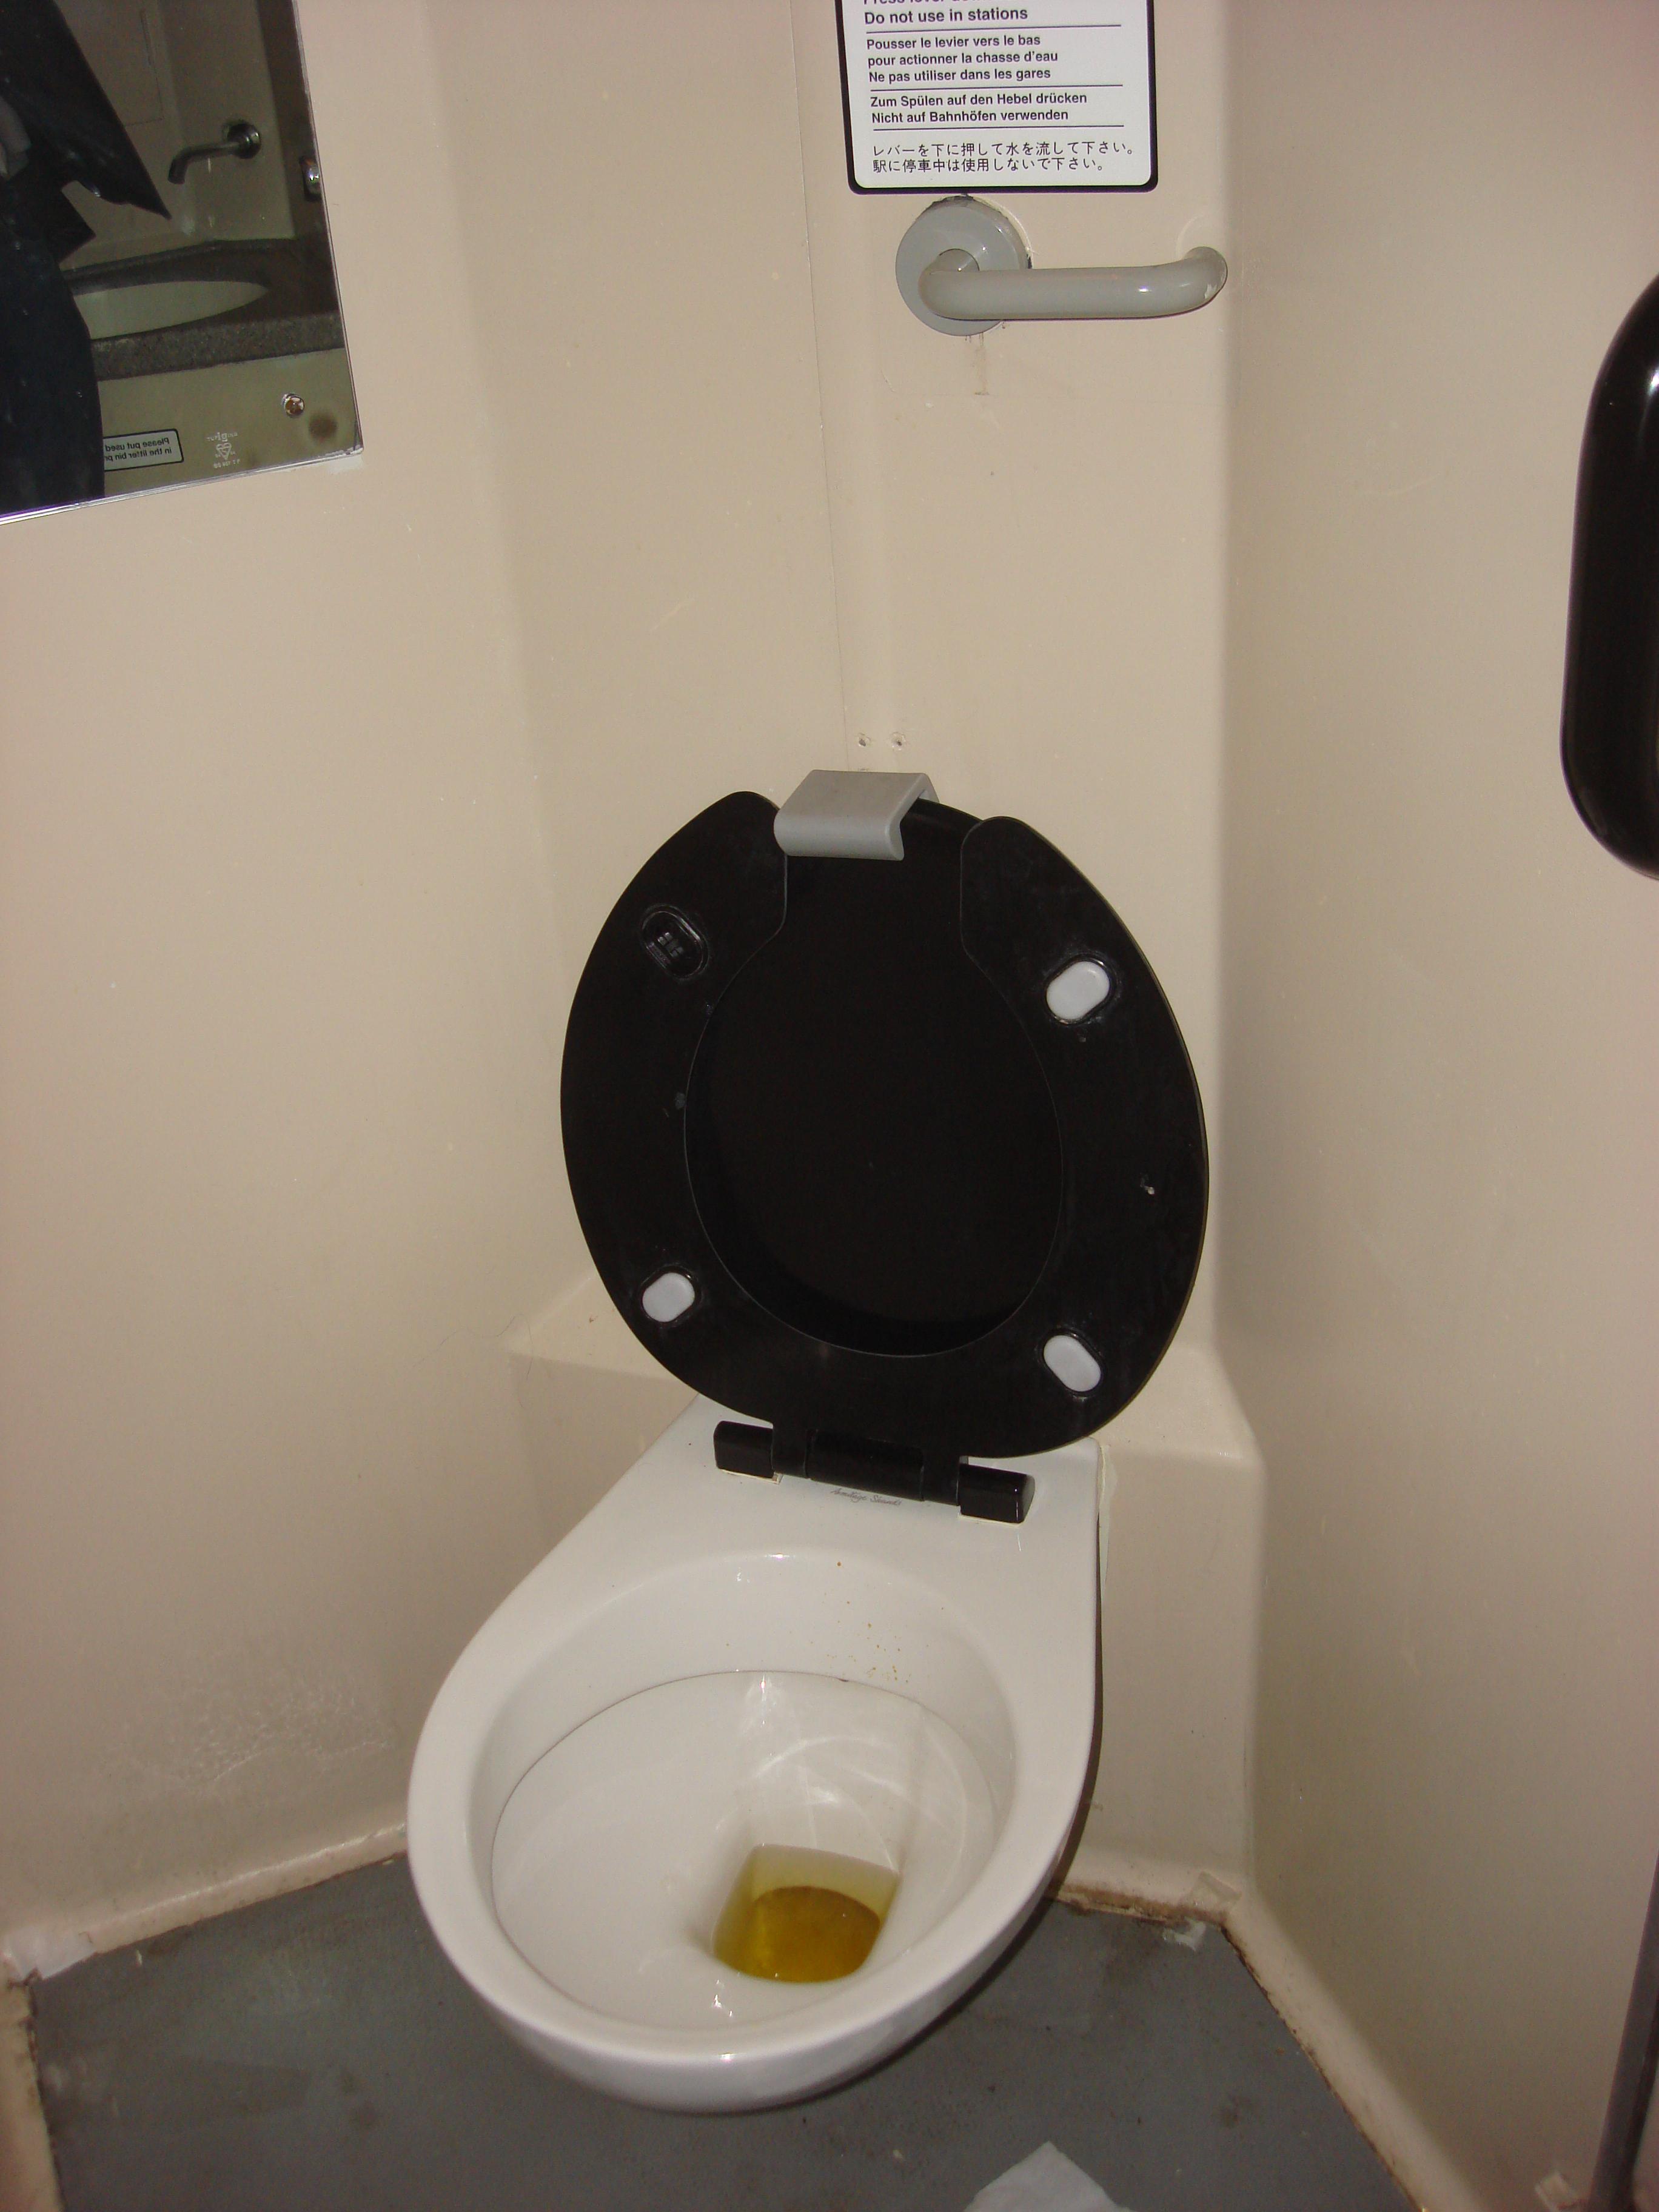 File:British Rail Cl 317 toilet 029.jpg - Wikimedia Commons on